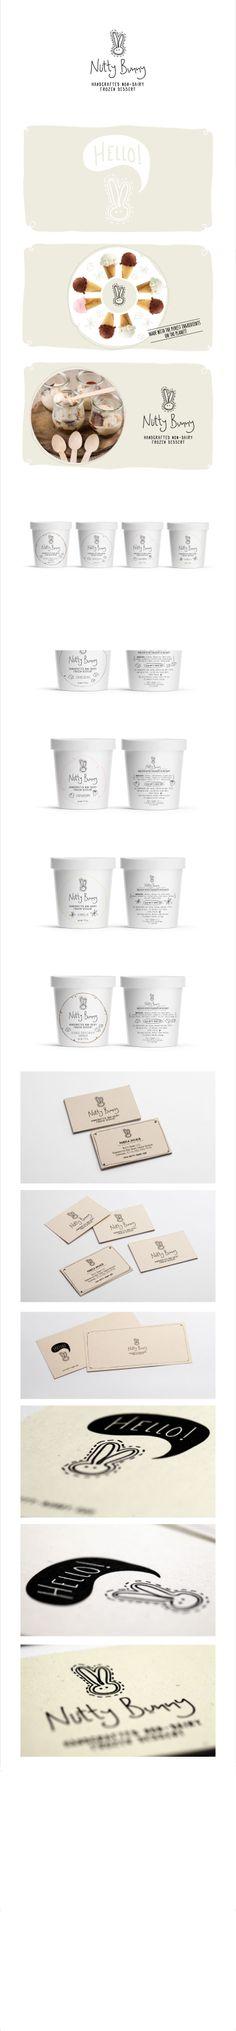 nutty bunny - ice cream   #logo #stationary #corporate #design #corporatedesign #identity #branding #behance